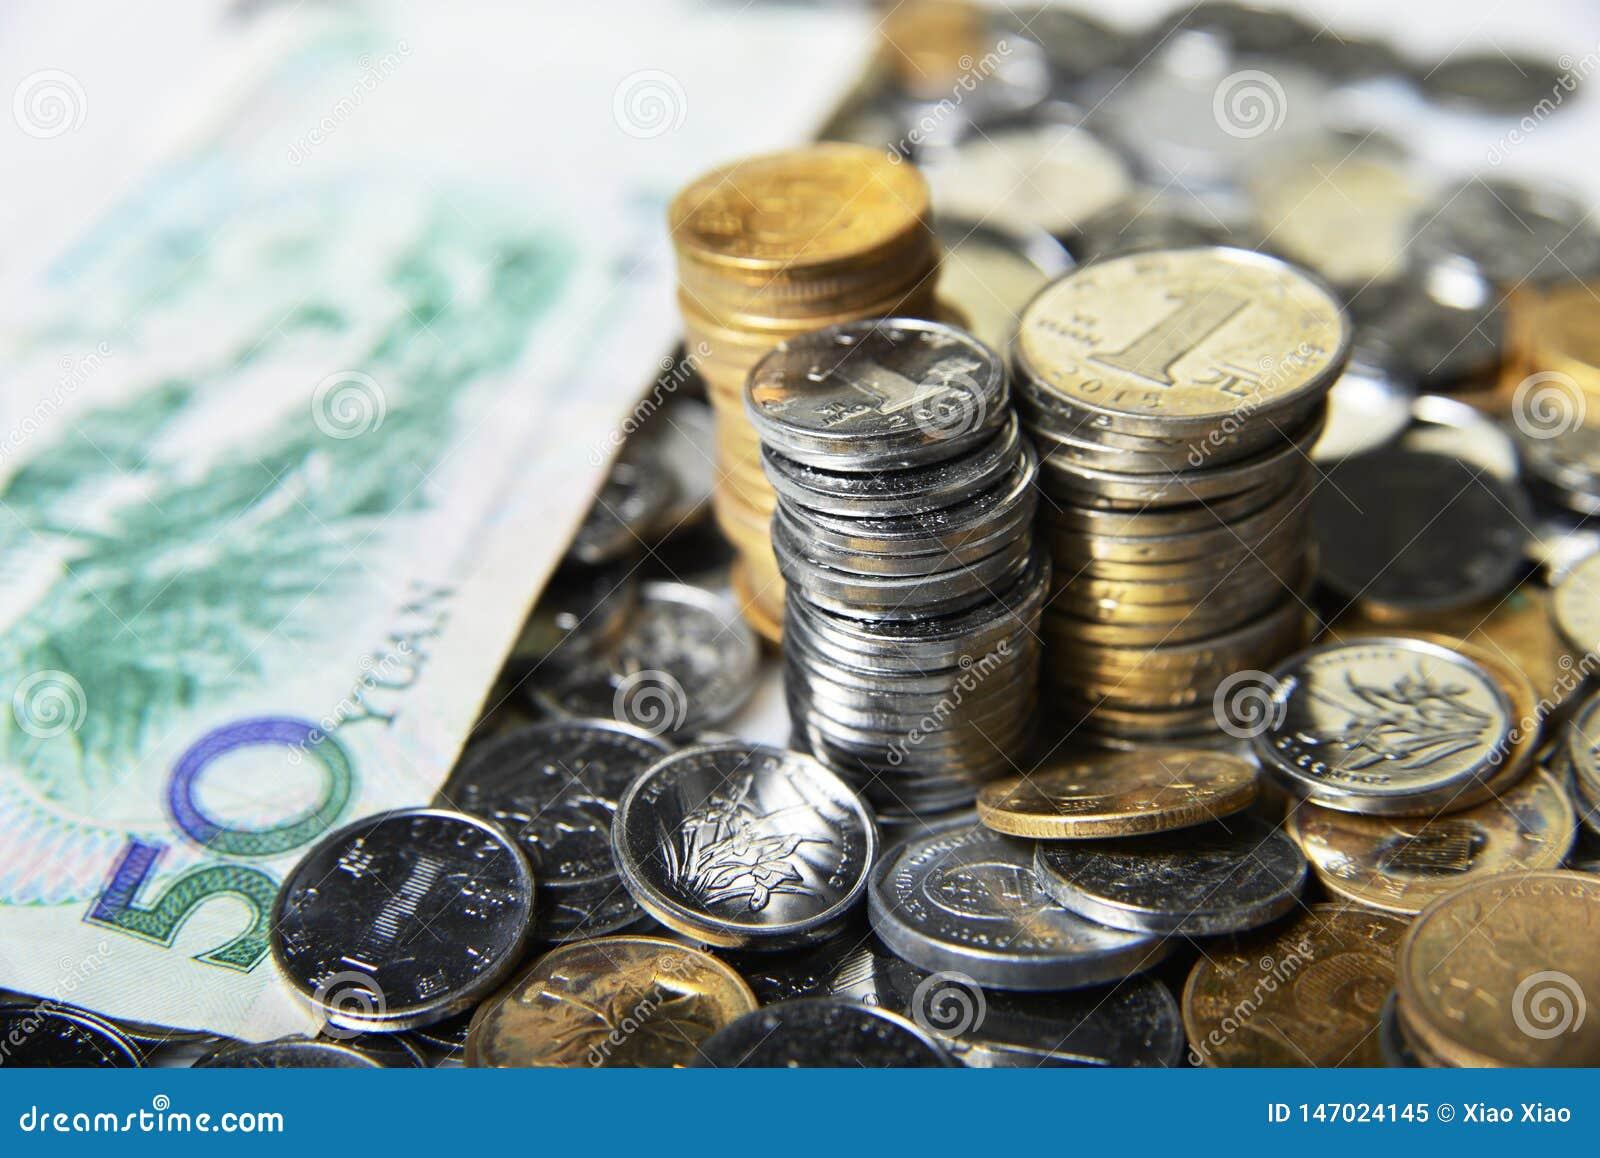 Copper coins